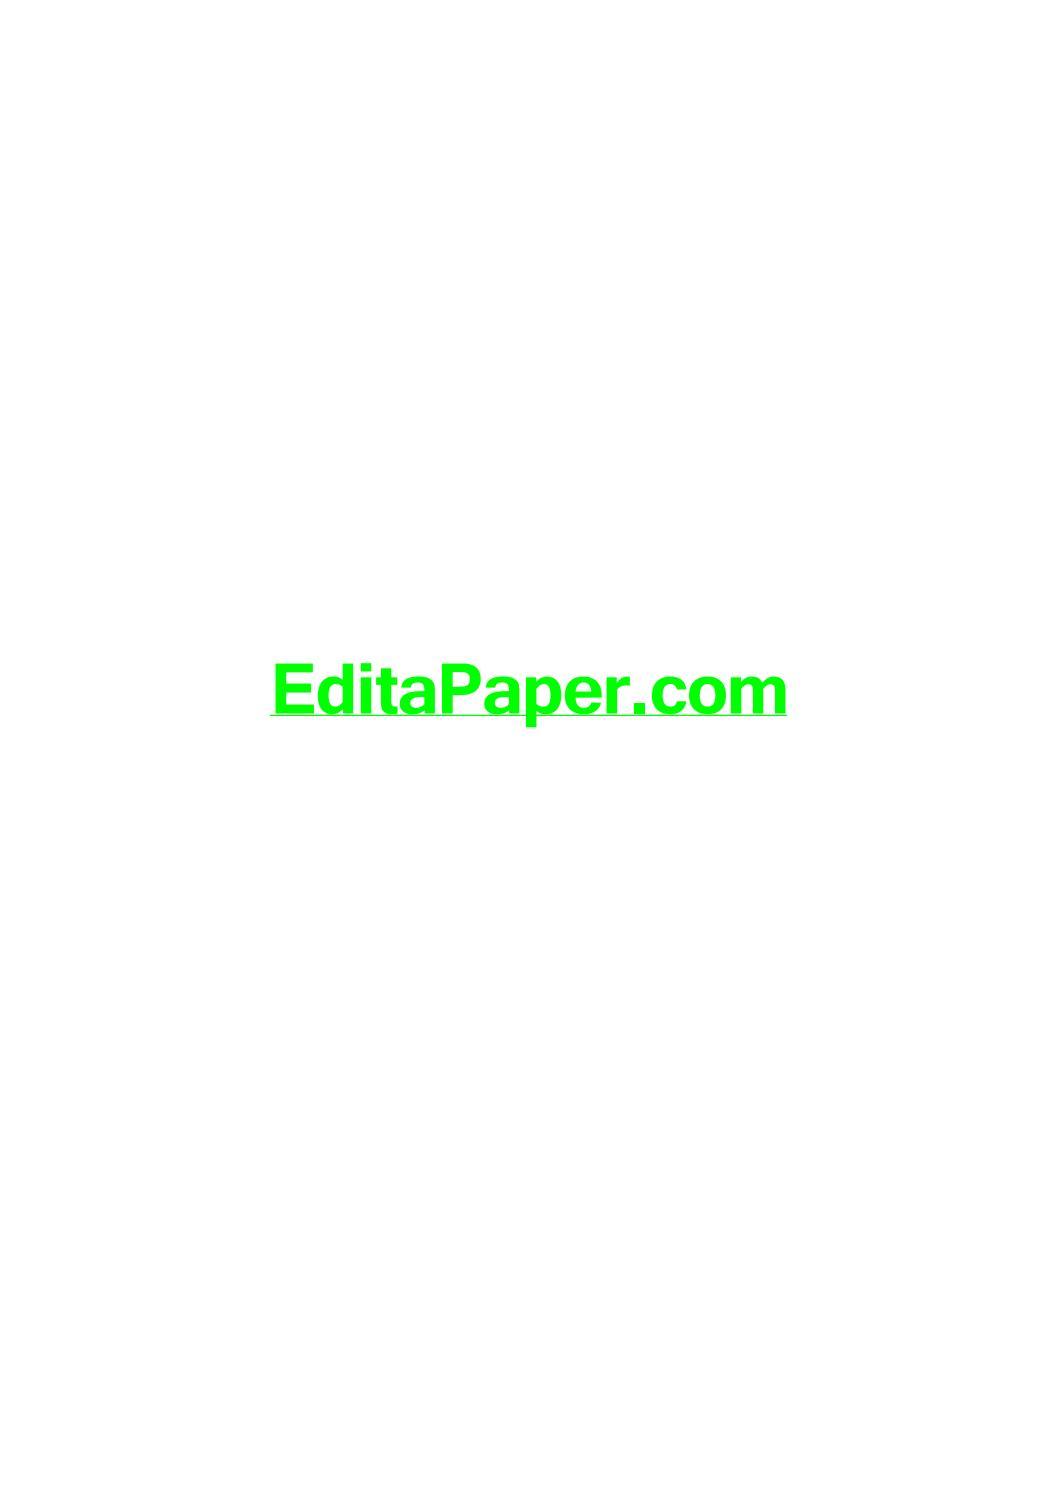 stanford essay prompts 2020